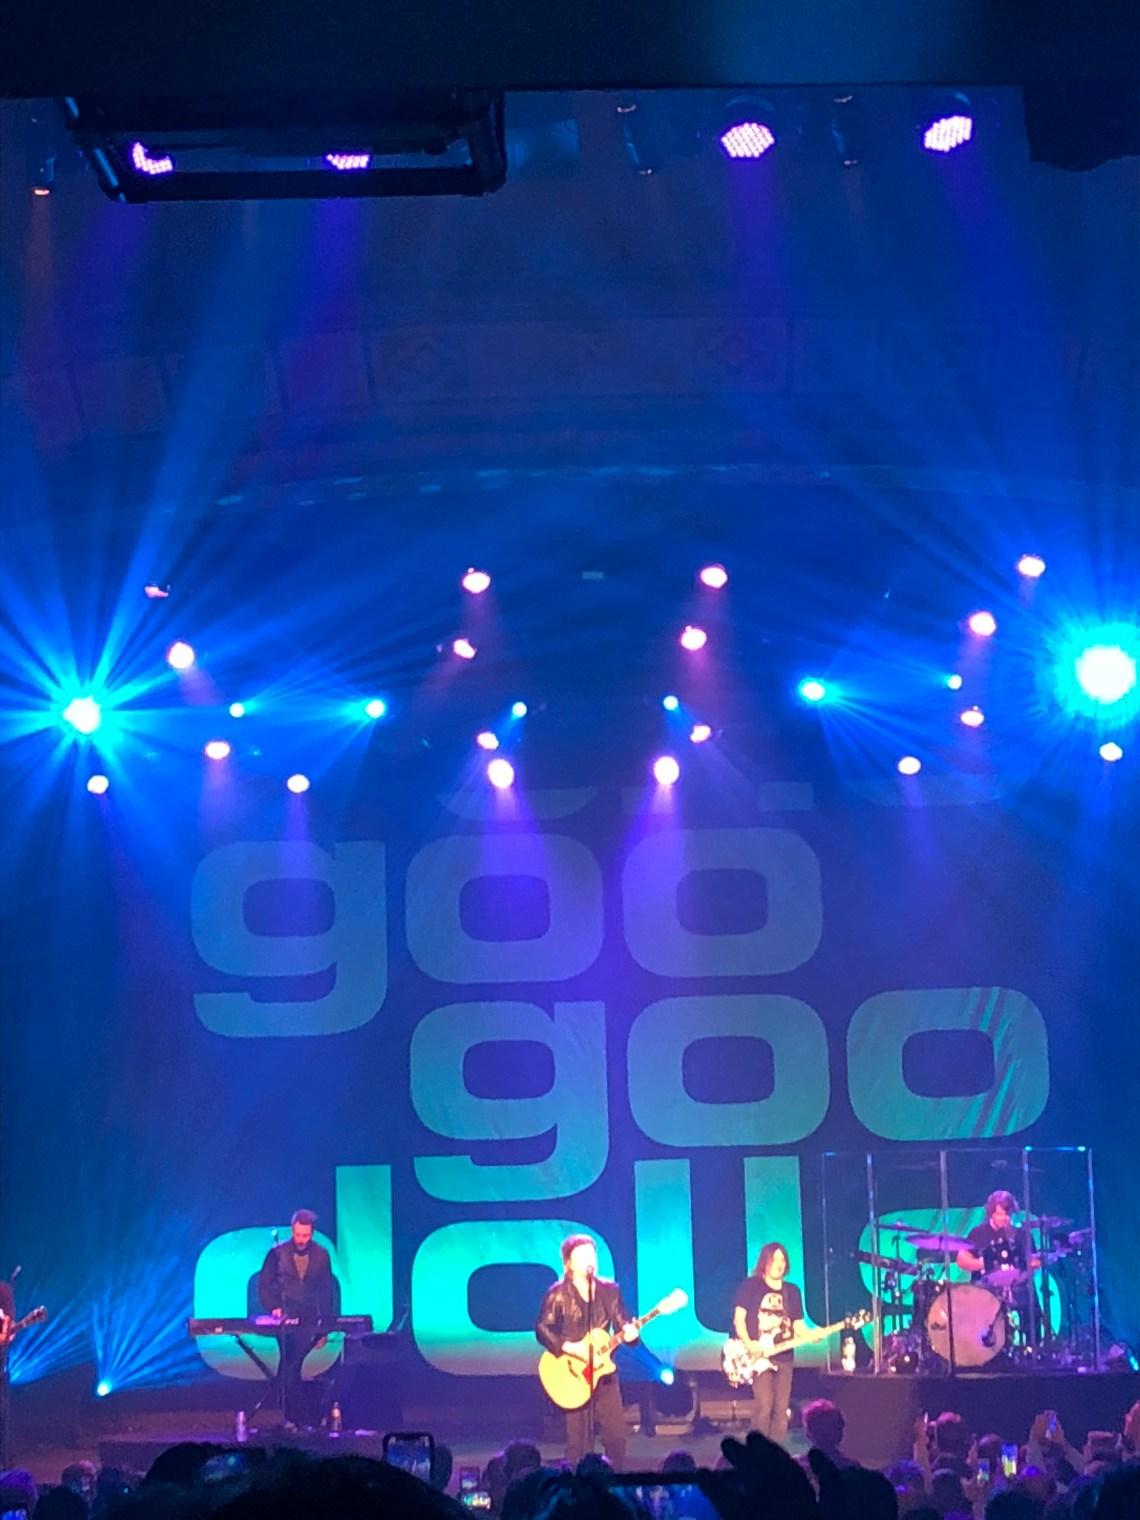 Goo Goo Dolls - Dizzy Up the Girl Anniversary